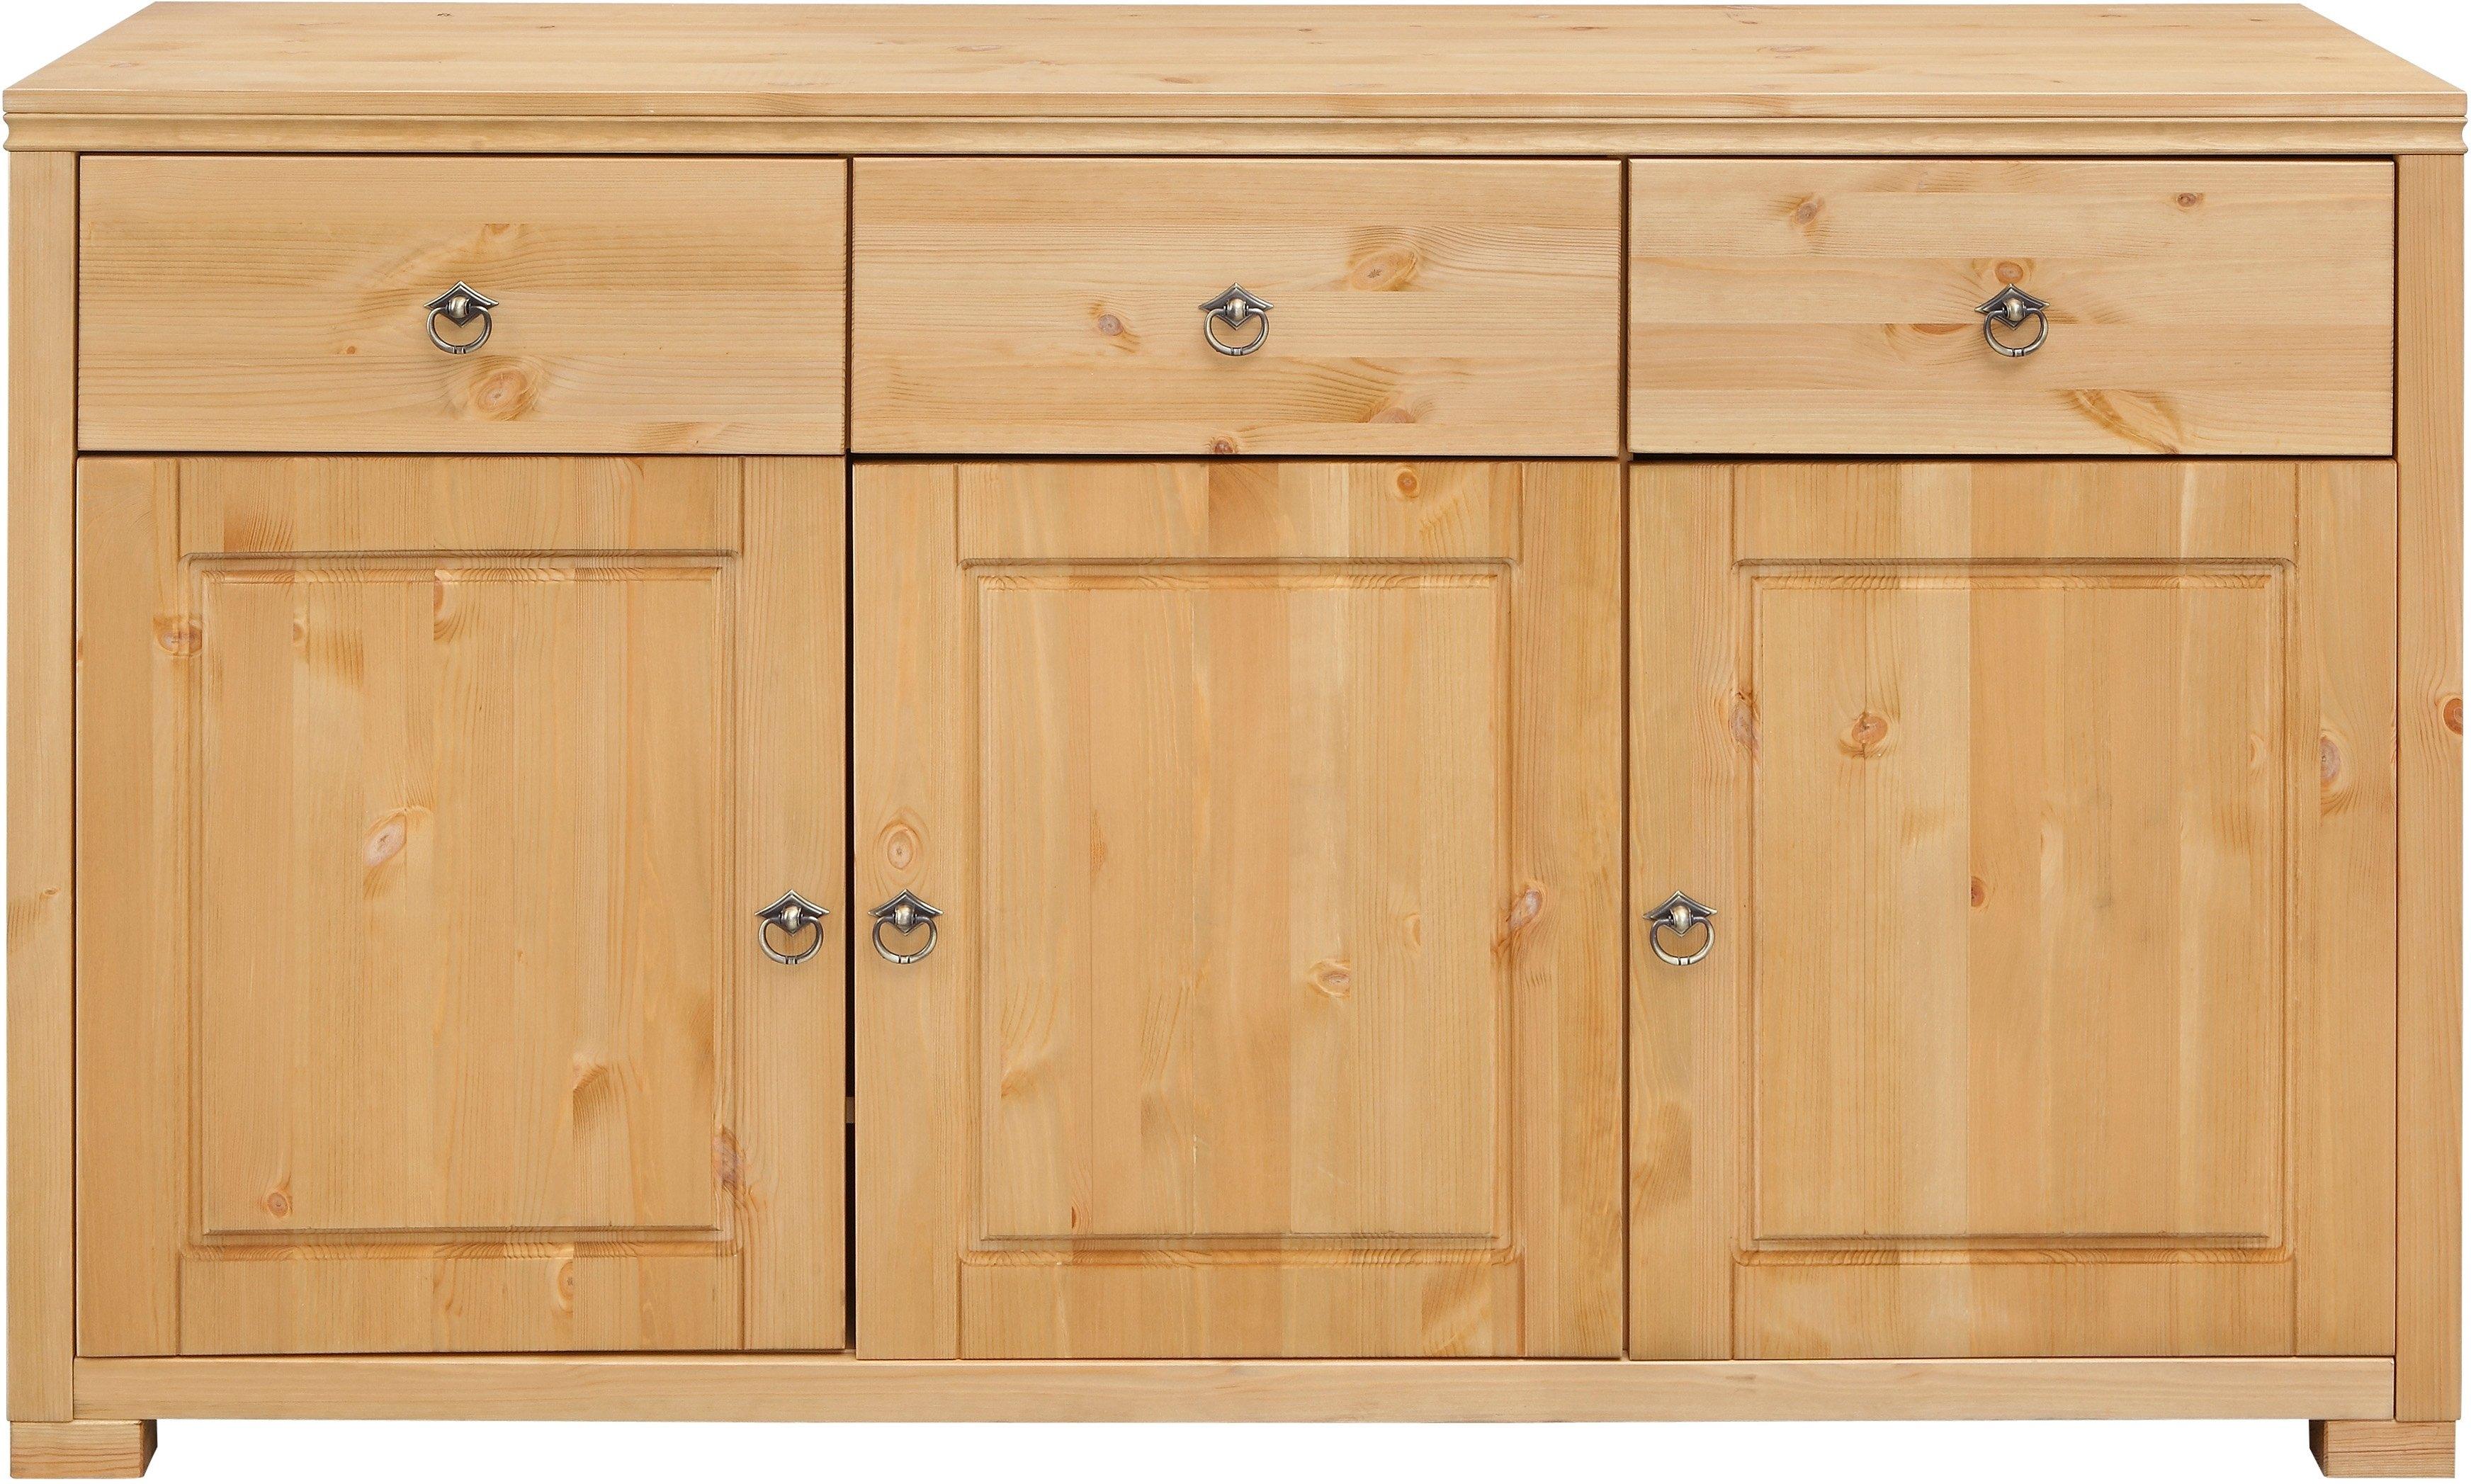 Home Affaire Sideboard Gotland breedte 147 cm nu online kopen bij OTTO